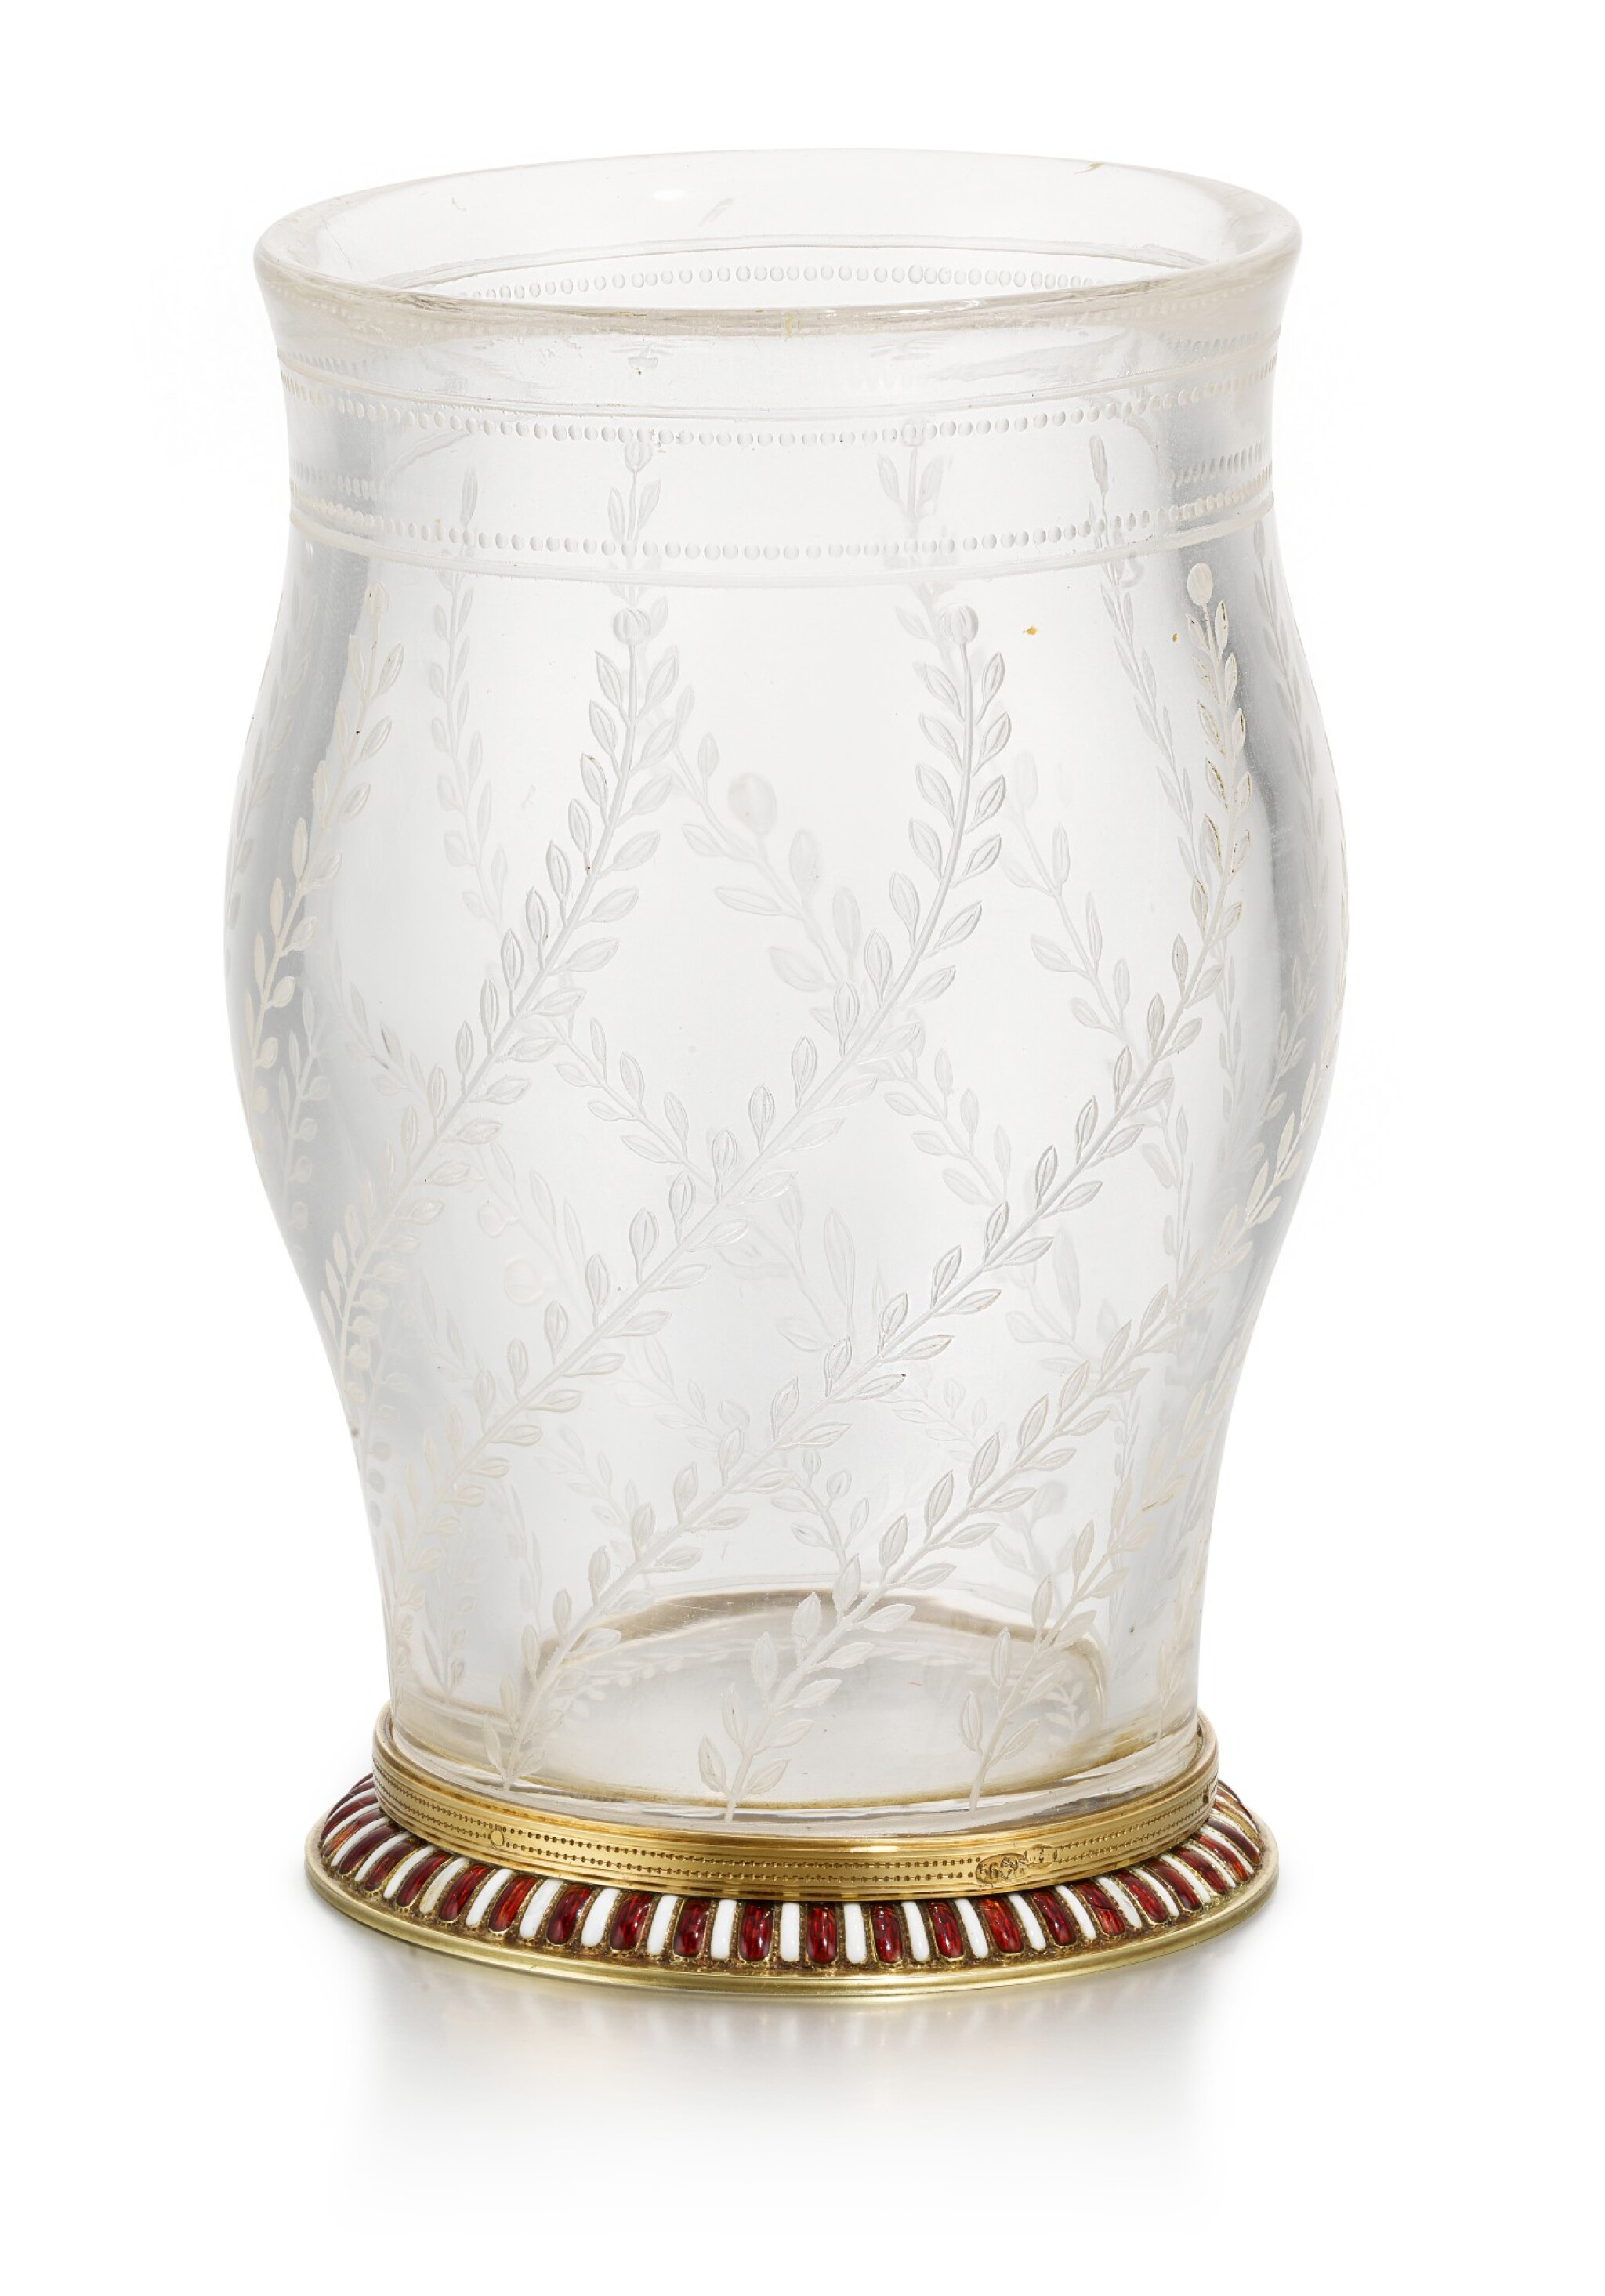 View full screen - View 1 of Lot 42. A Fabergé en plein enamel gold-mounted rock crystal vase, workmaster Michael Perchin, St Petersburg, 1899-1903.